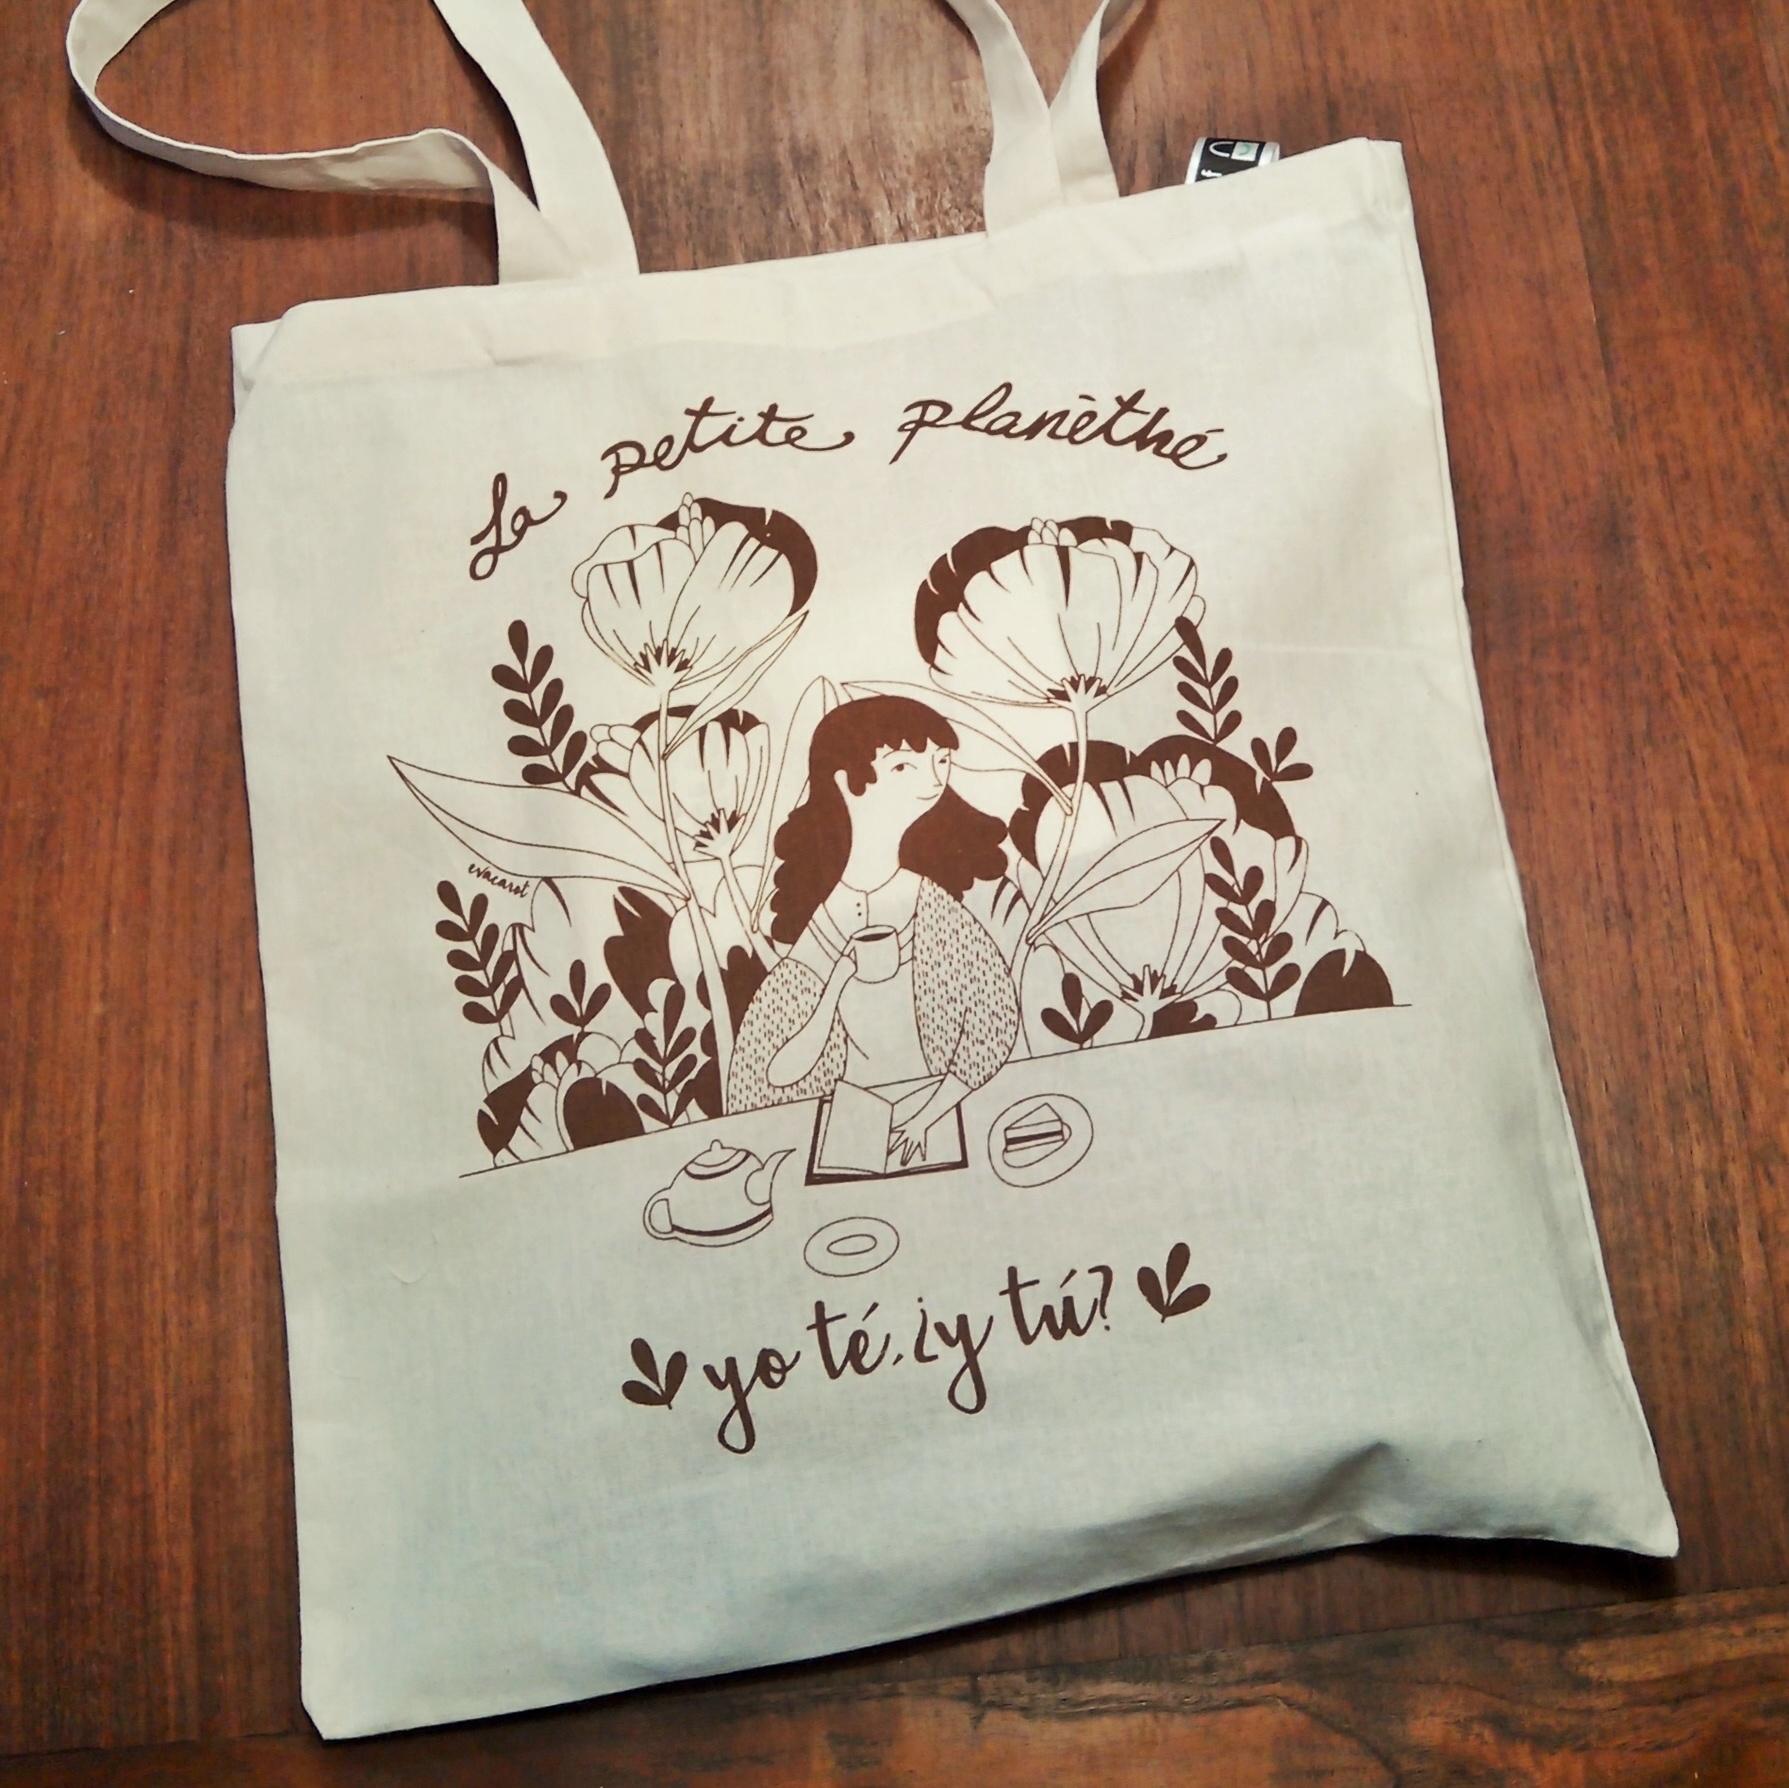 Bolsa de Algodón. Ilustración de Eva Carot - Edición Limitada 2016 - 6º Aniversario